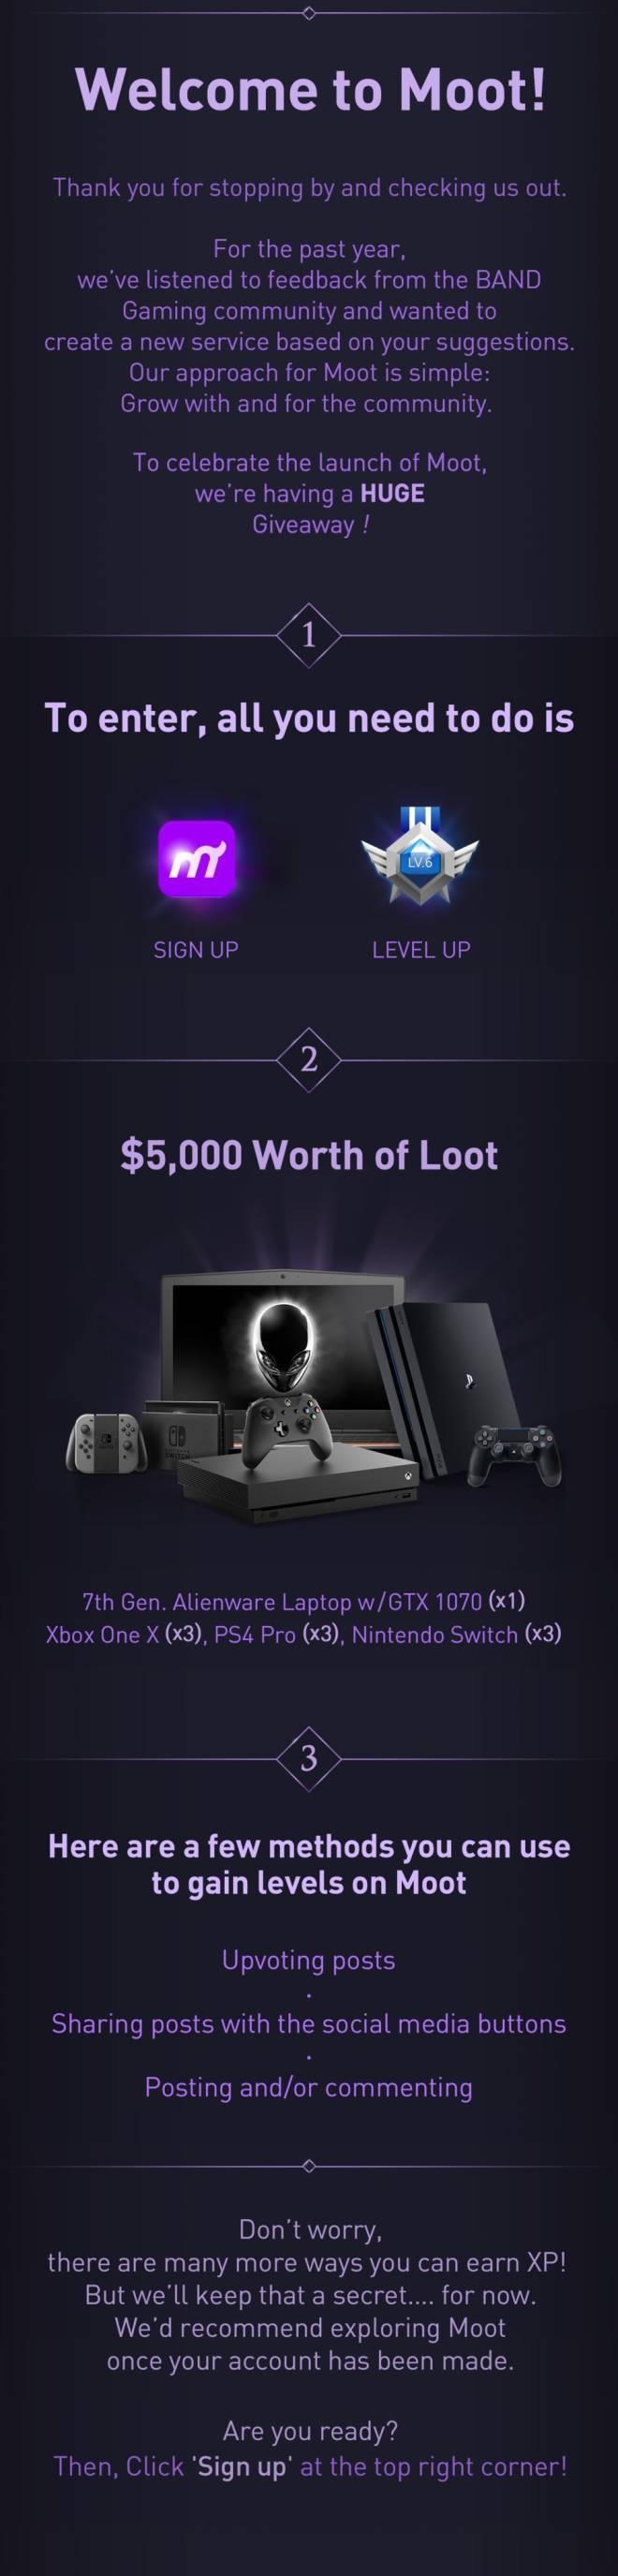 Moot: Notice - Moot Brings the Loot 🎁 image 4